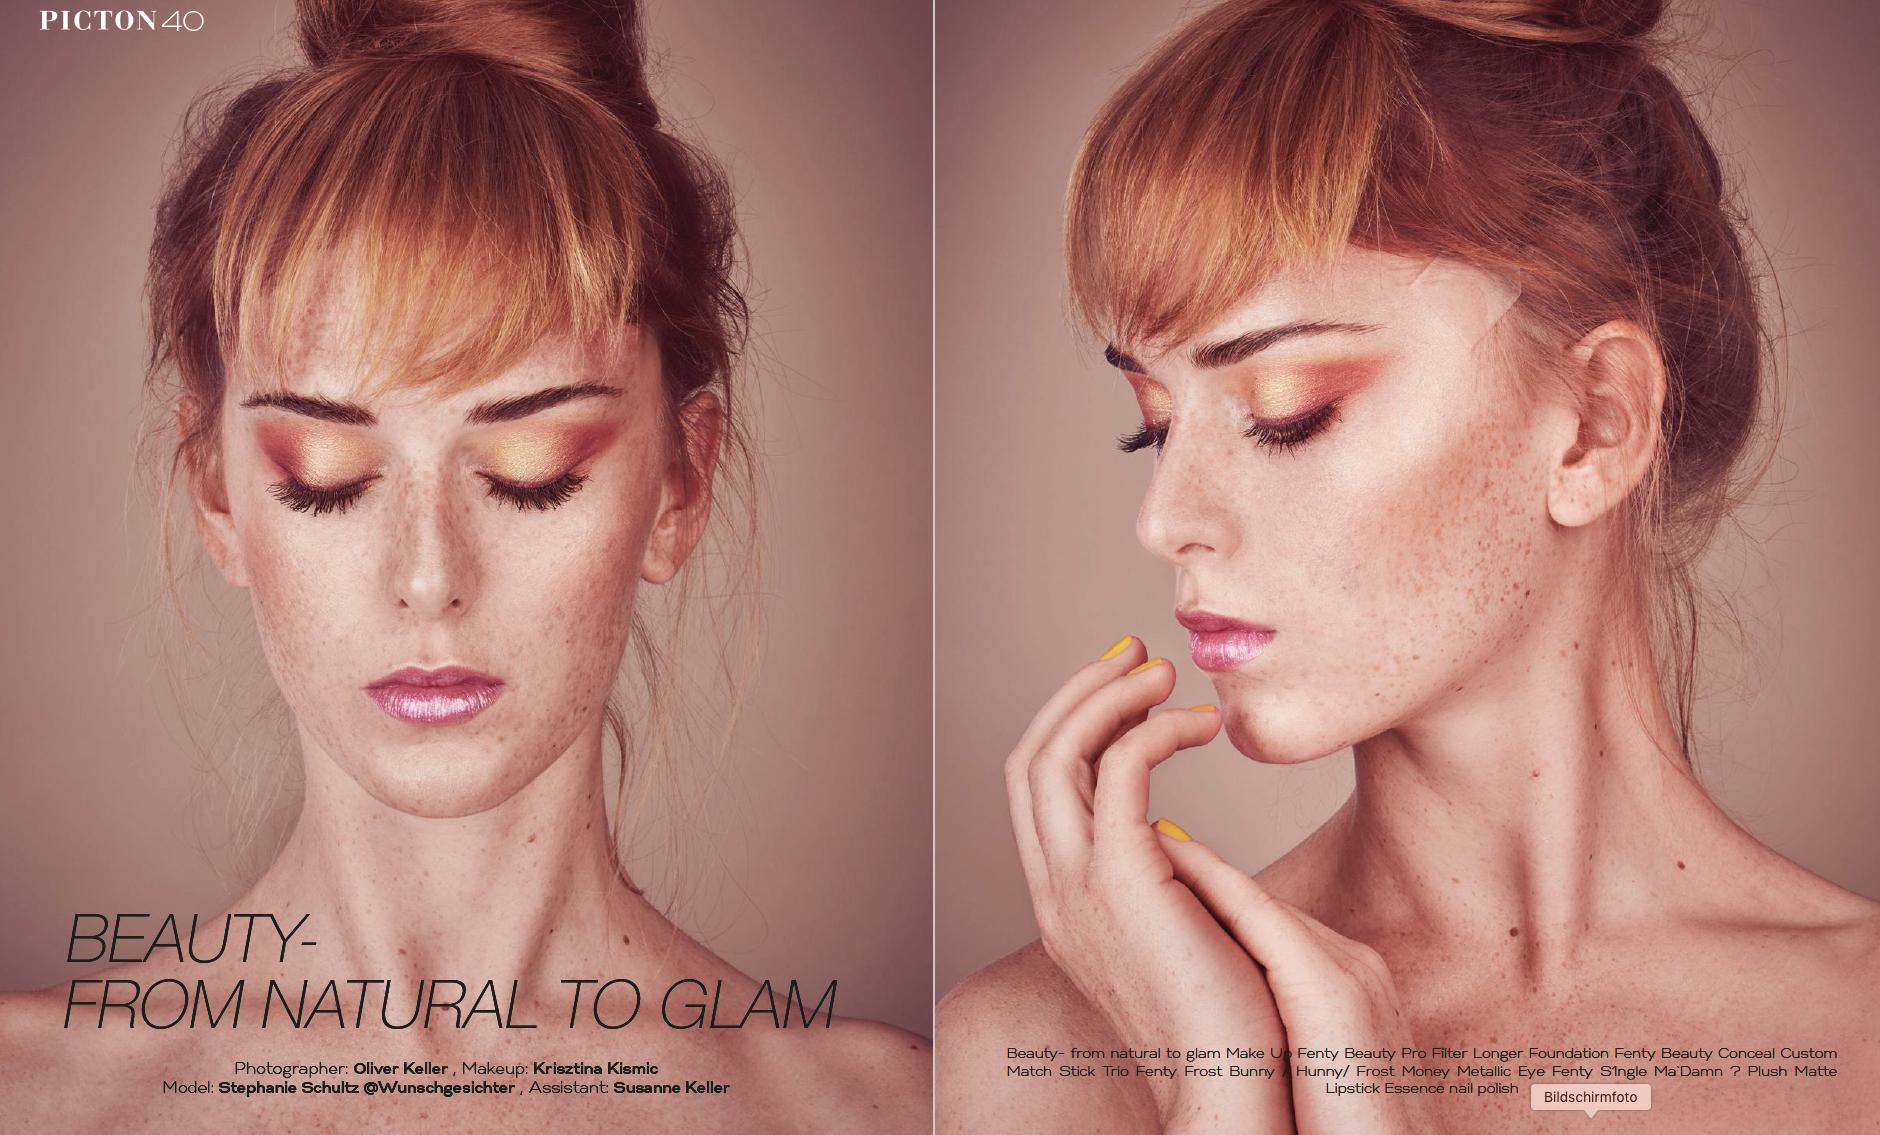 Picton Magazin Stephanie.jpg